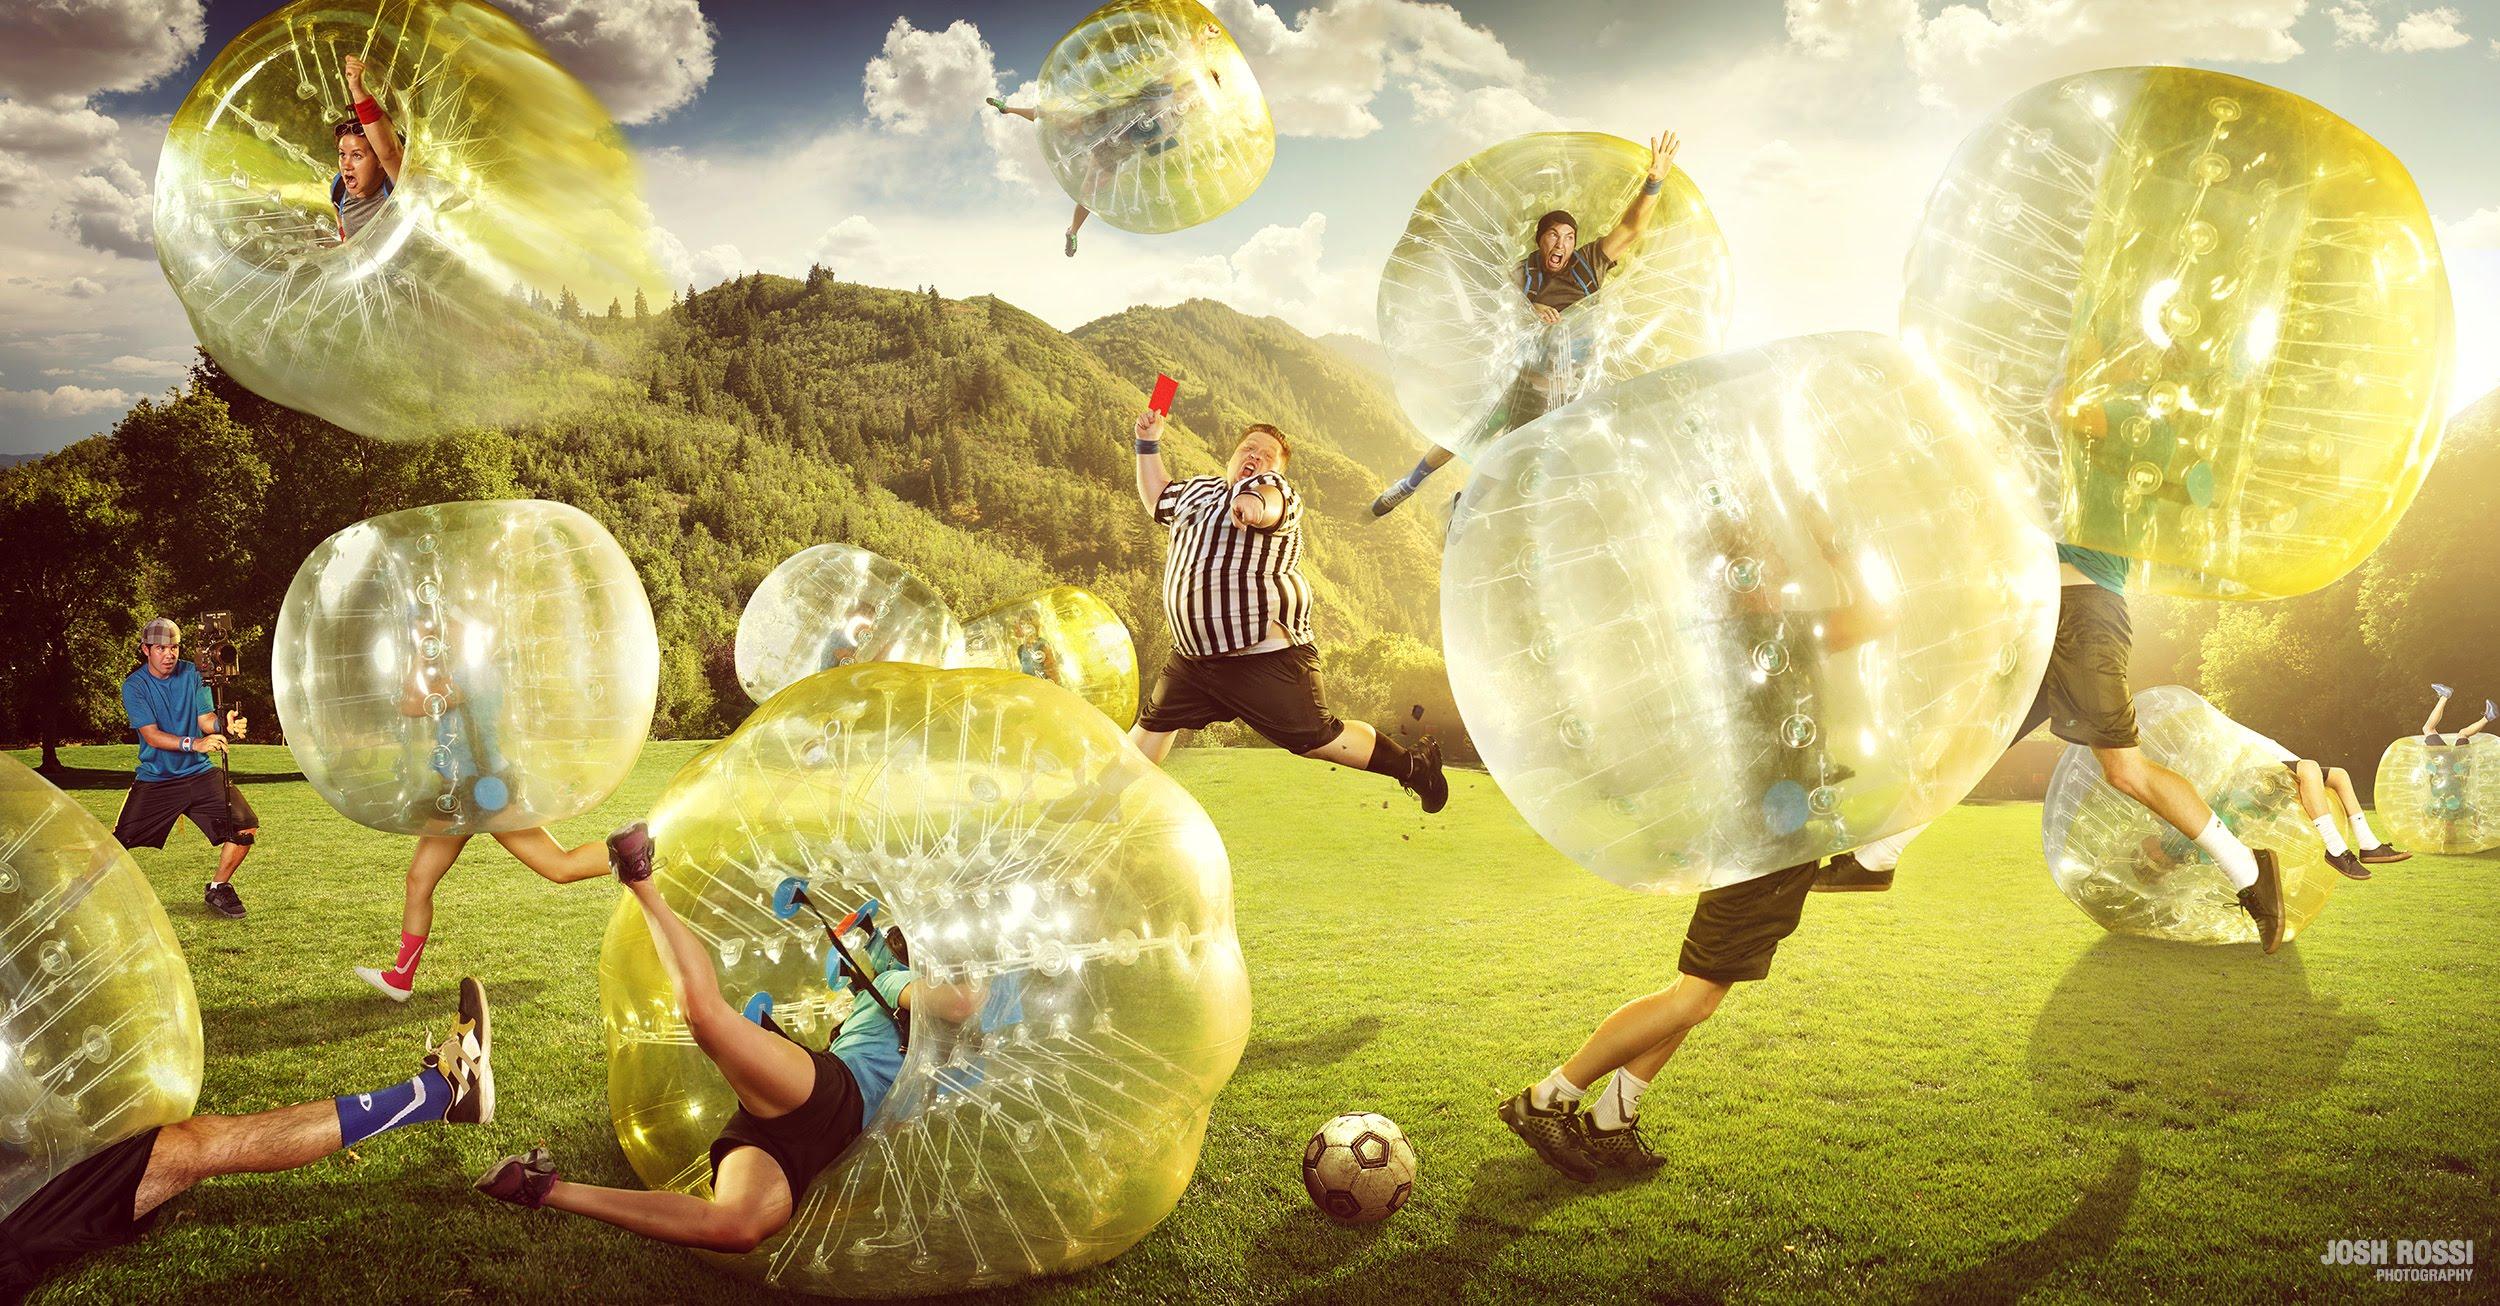 VIDEO – Neparastā futbola spēle! (Greatest Game Ever Played – Zorb Soccer with Champion)